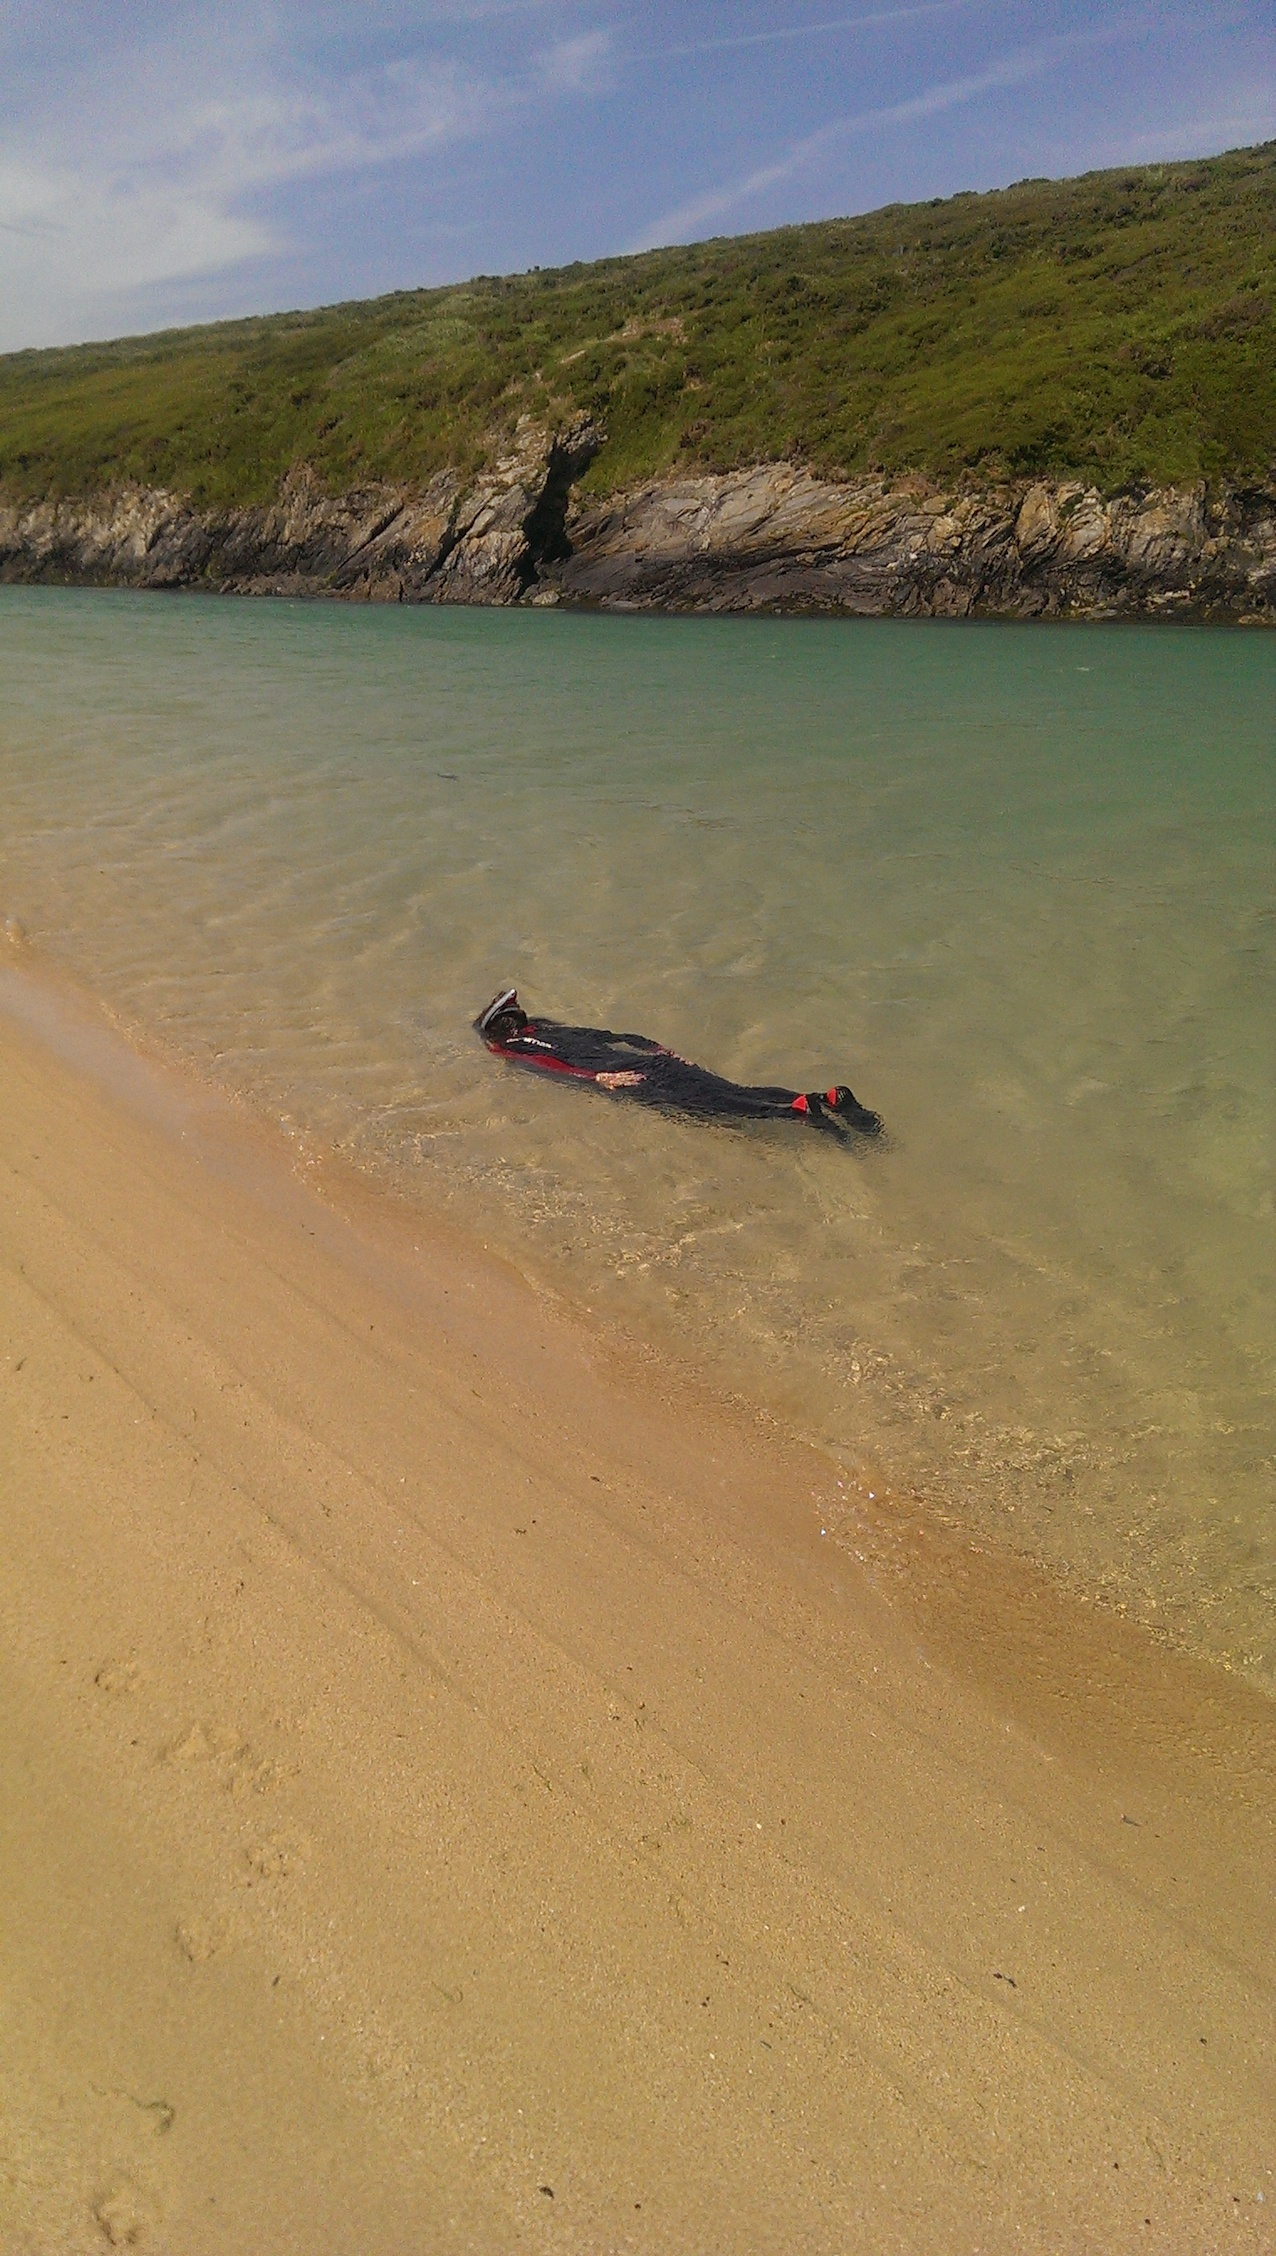 The Cornwall waters looking more like Grecian seas!